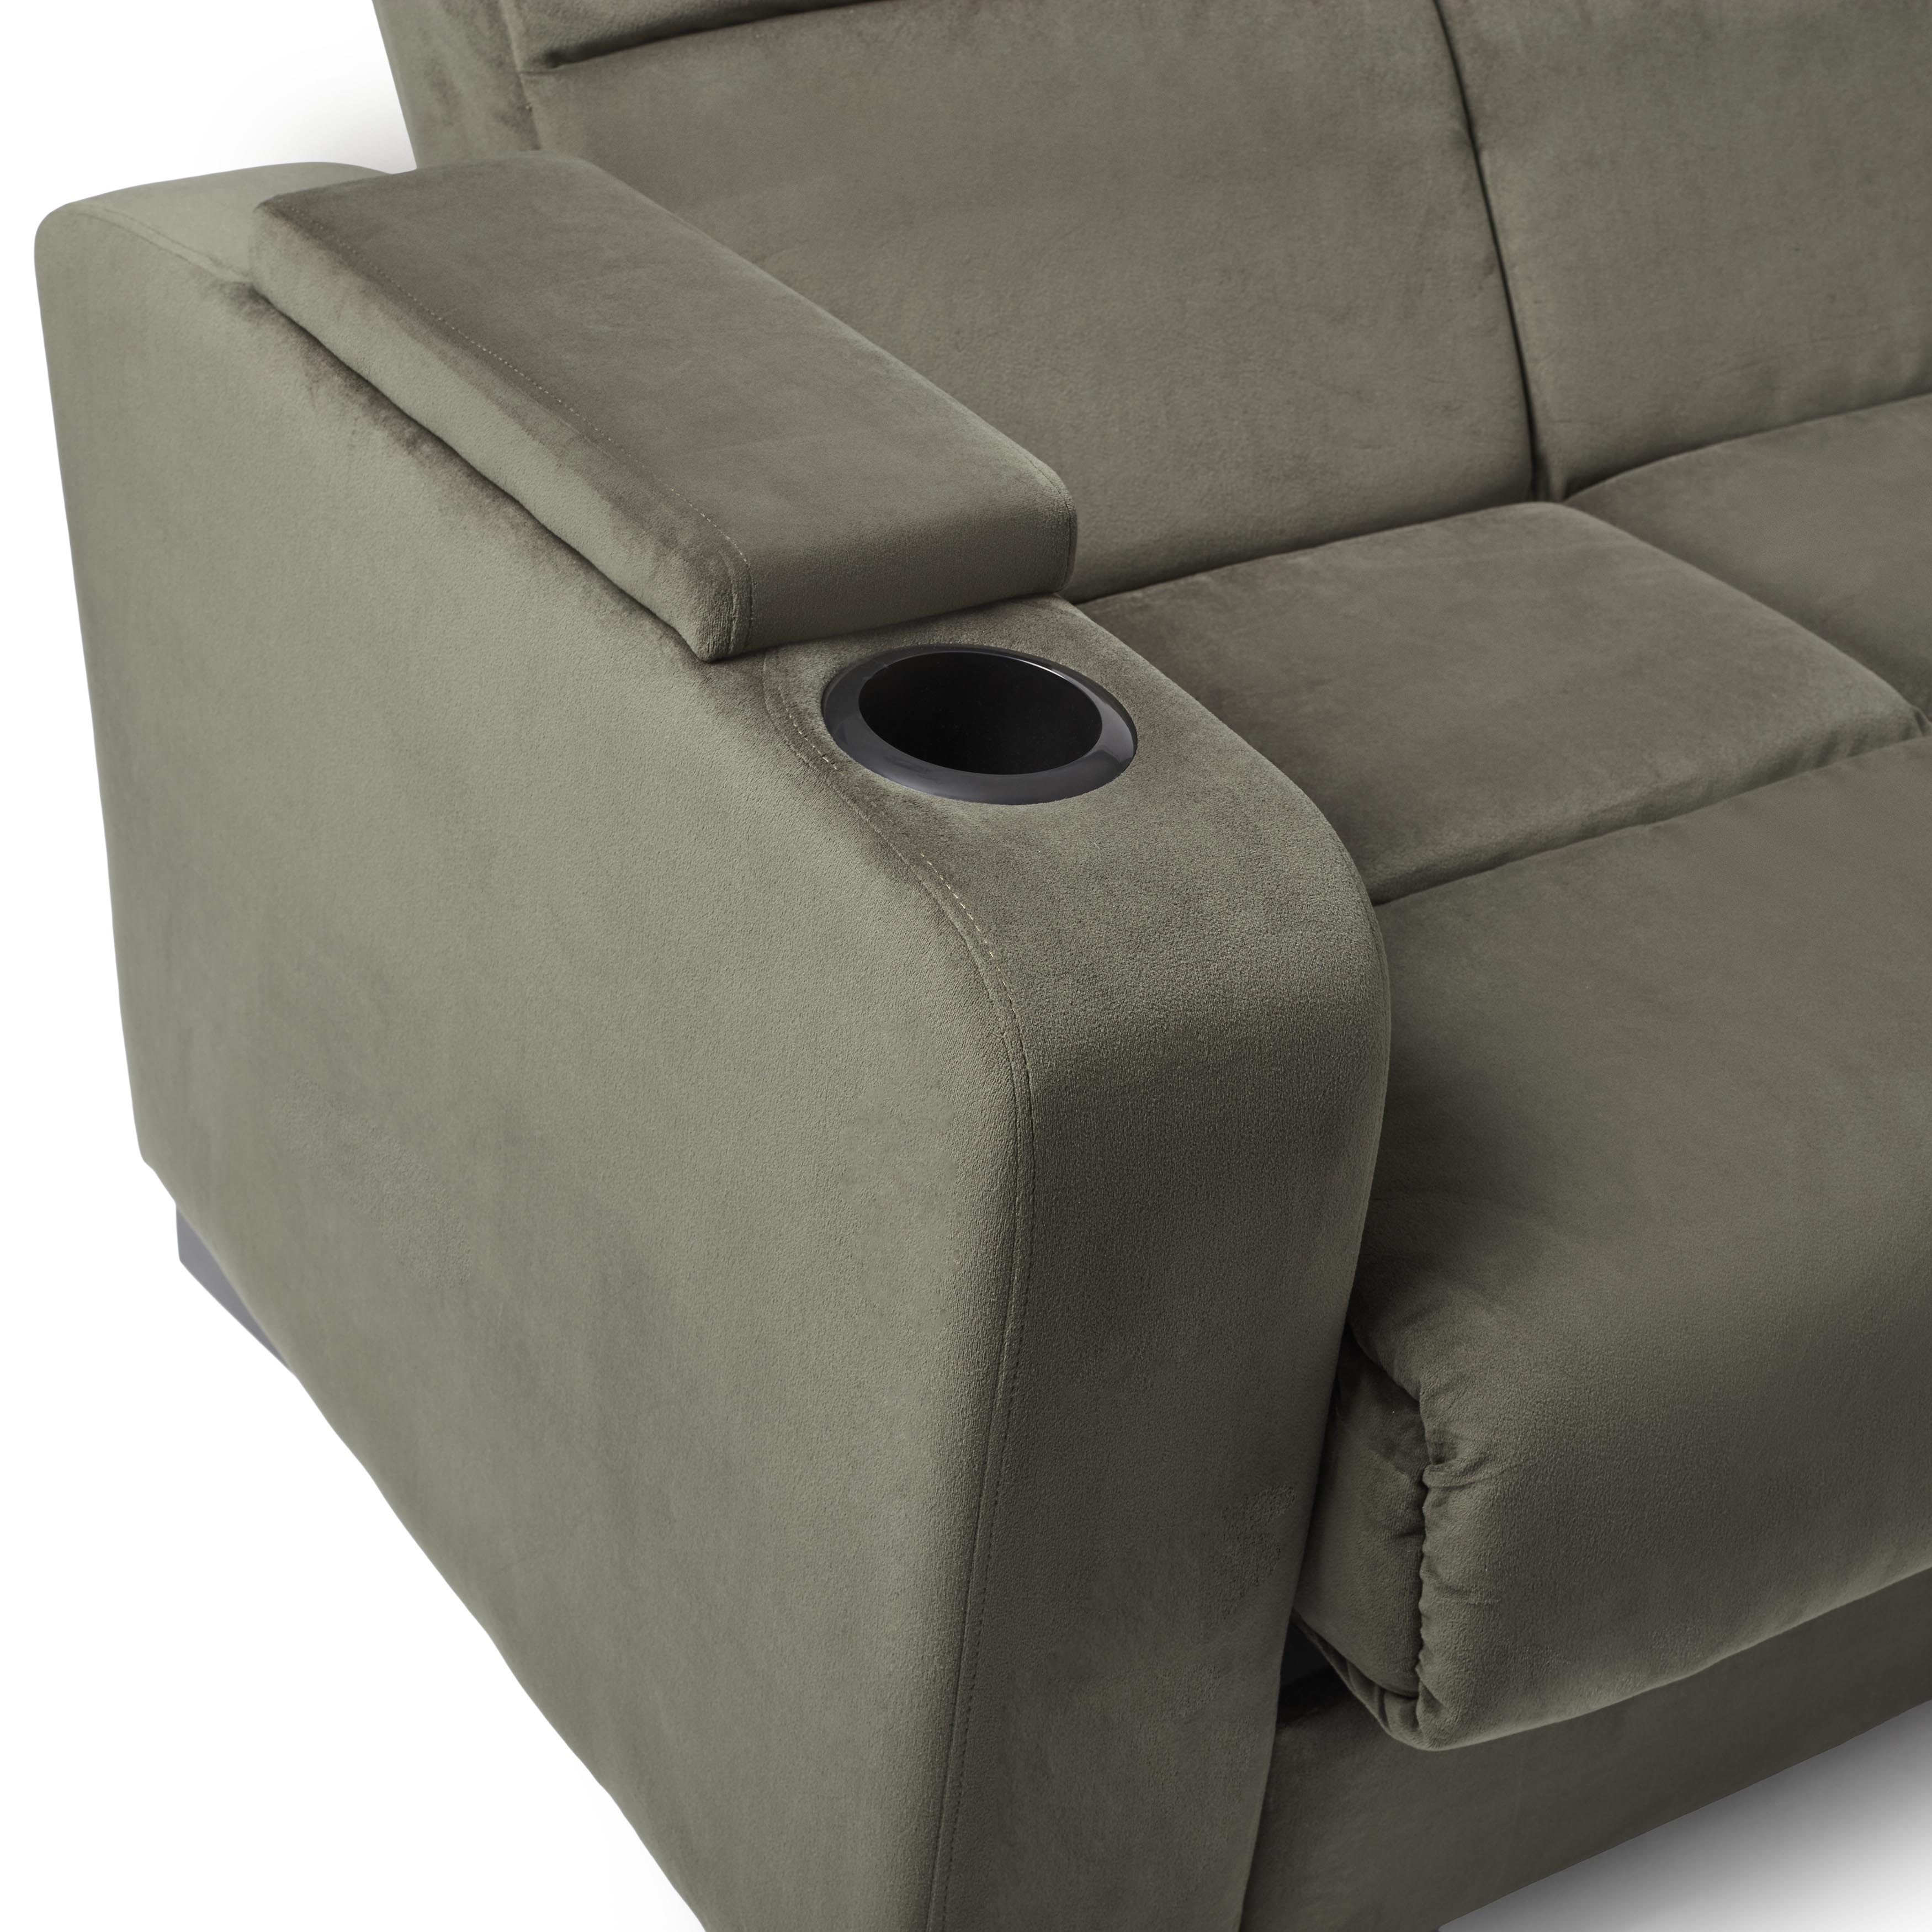 low priced 82dc4 826ae Copper Grove Jessie Grey Velvet Convert-a-Couch Futon Sofa Sleeper